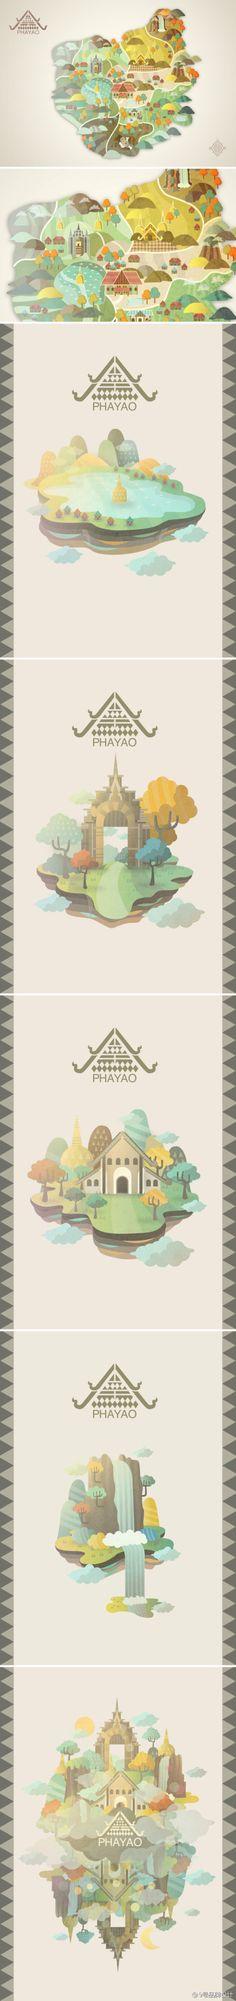 ideas camping illustration graphics behance for 2019 Illustration Design Graphique, Digital Illustration, Graphic Illustration, Graphic Art, Garden Illustration, Travel Illustration, Game Design, Web Design, Dm Poster